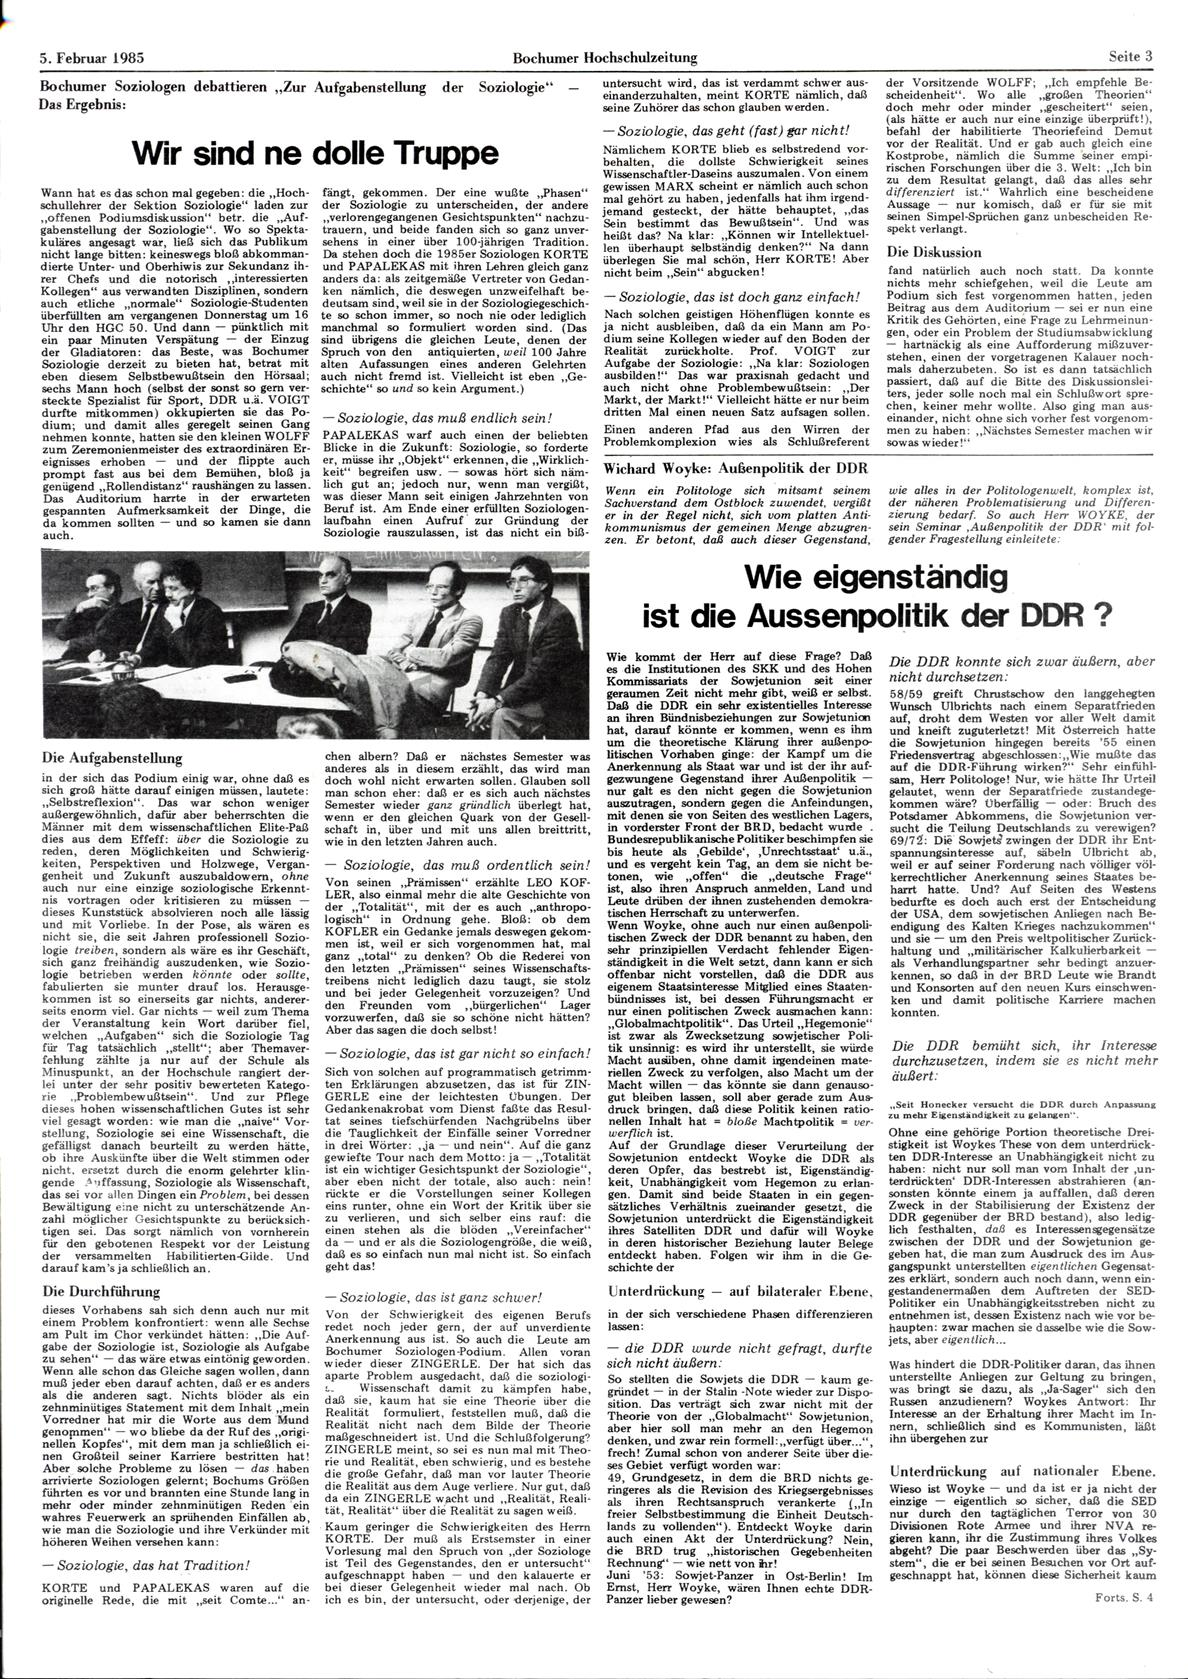 Bochum_BHZ_19850205_107_003